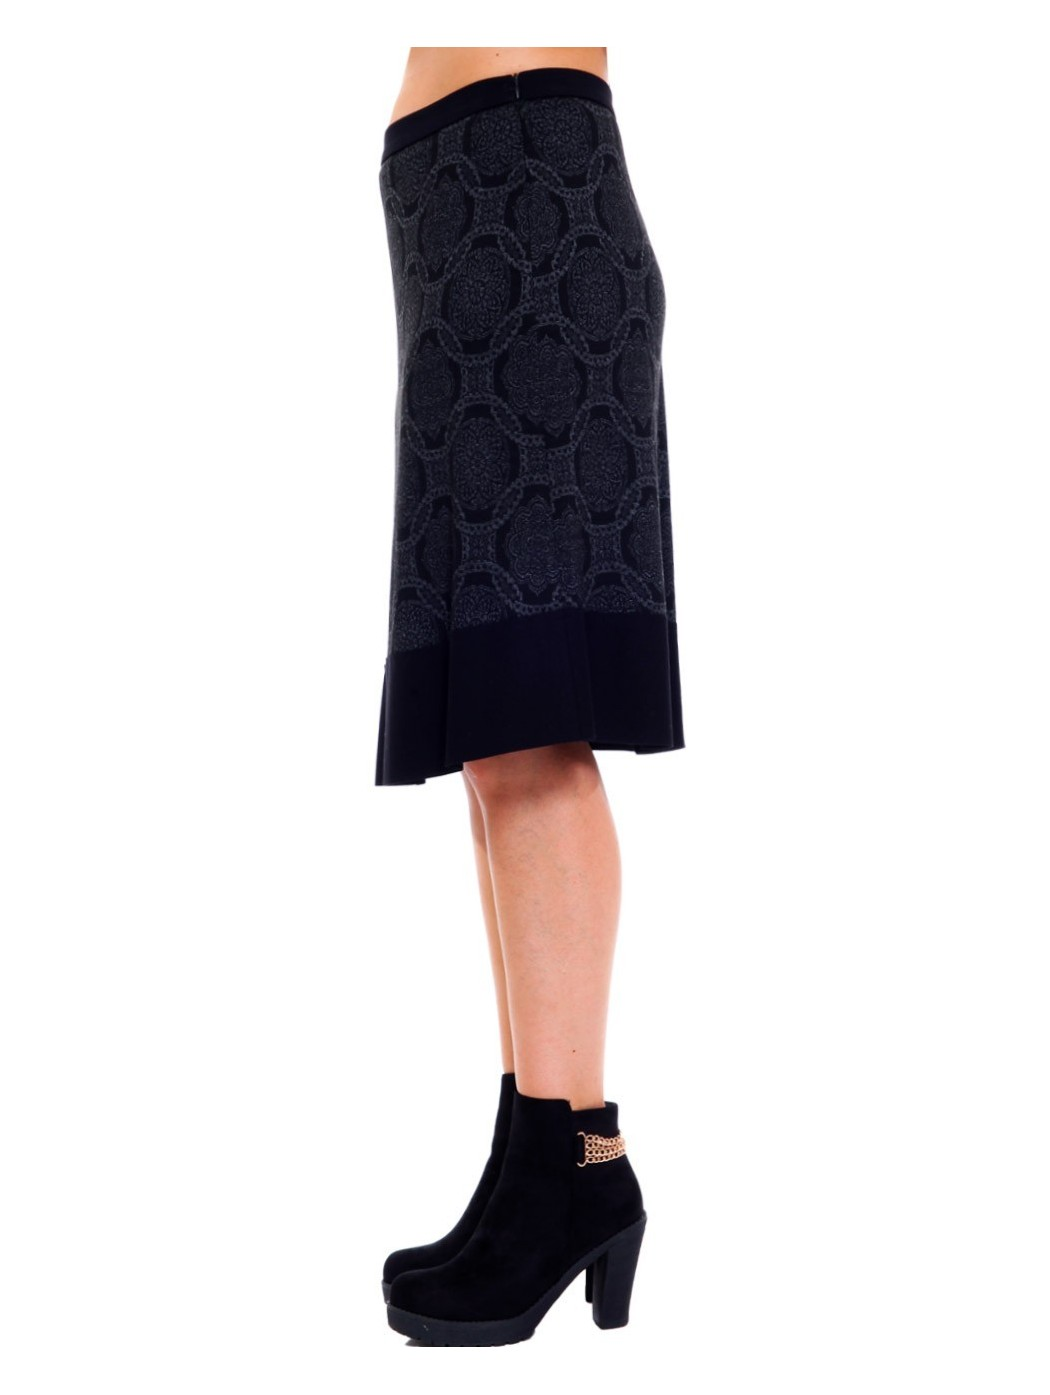 Pucci skirt